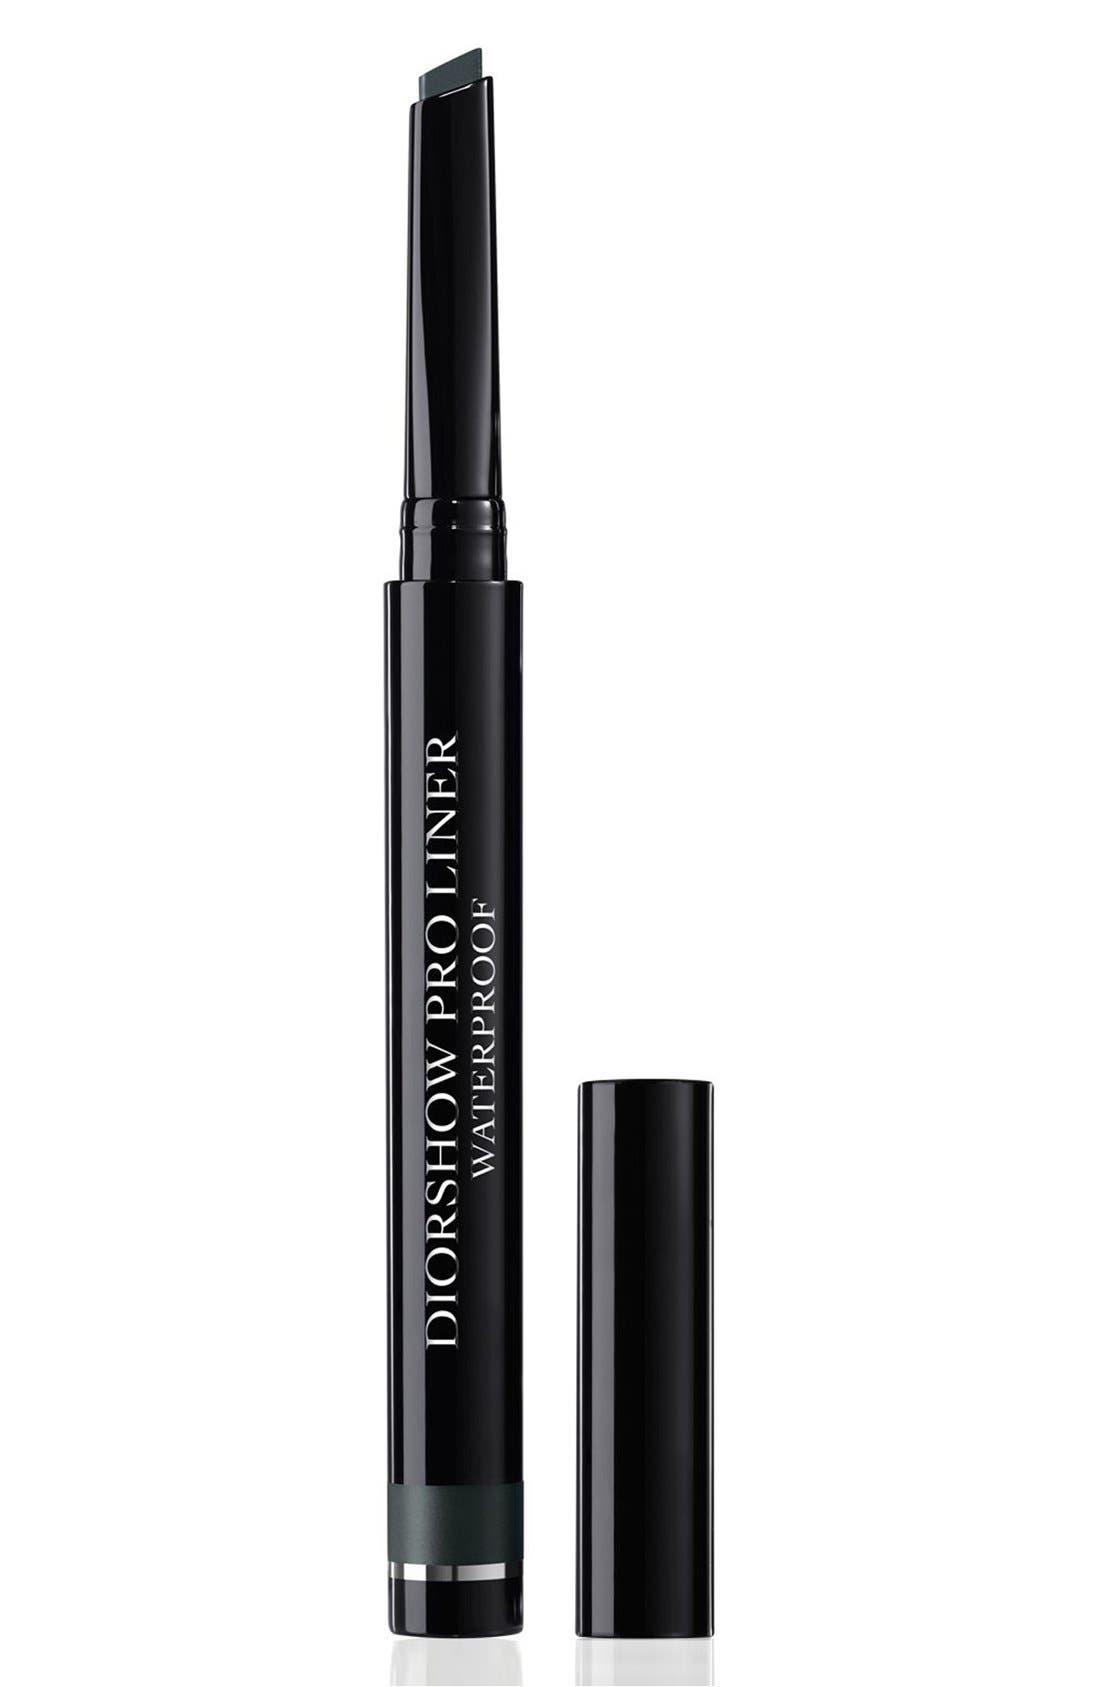 Dior Diorshow Waterproof Pro Liner - 082 Pro Anthracite